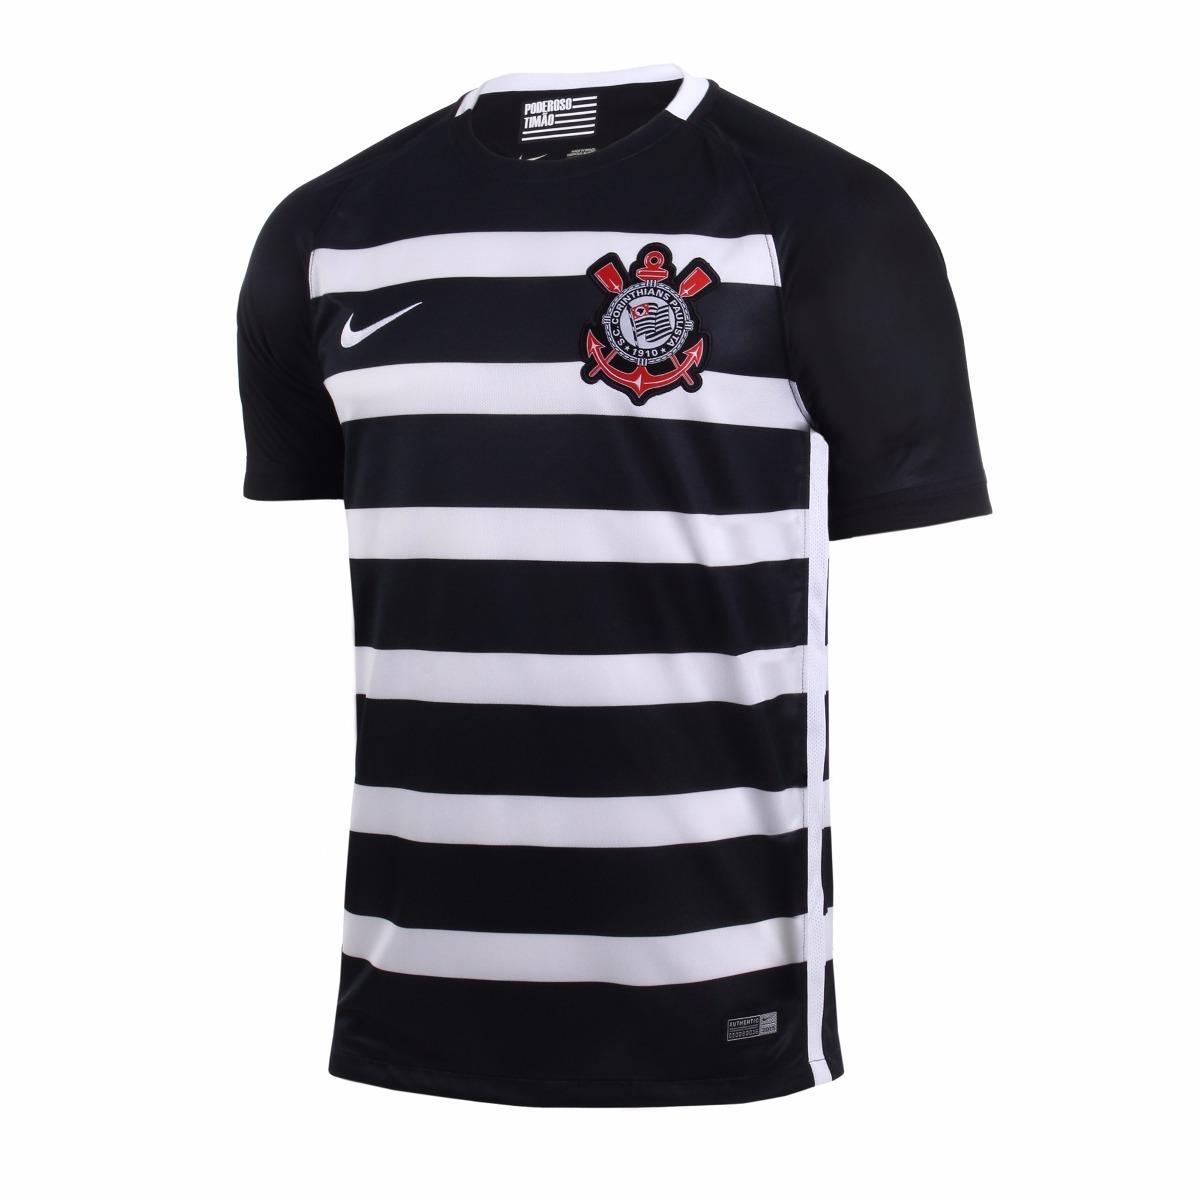 camisa corinthians nike ii - 2015   2016 - s nº - torcedor. Carregando zoom. 7a212ac056df5